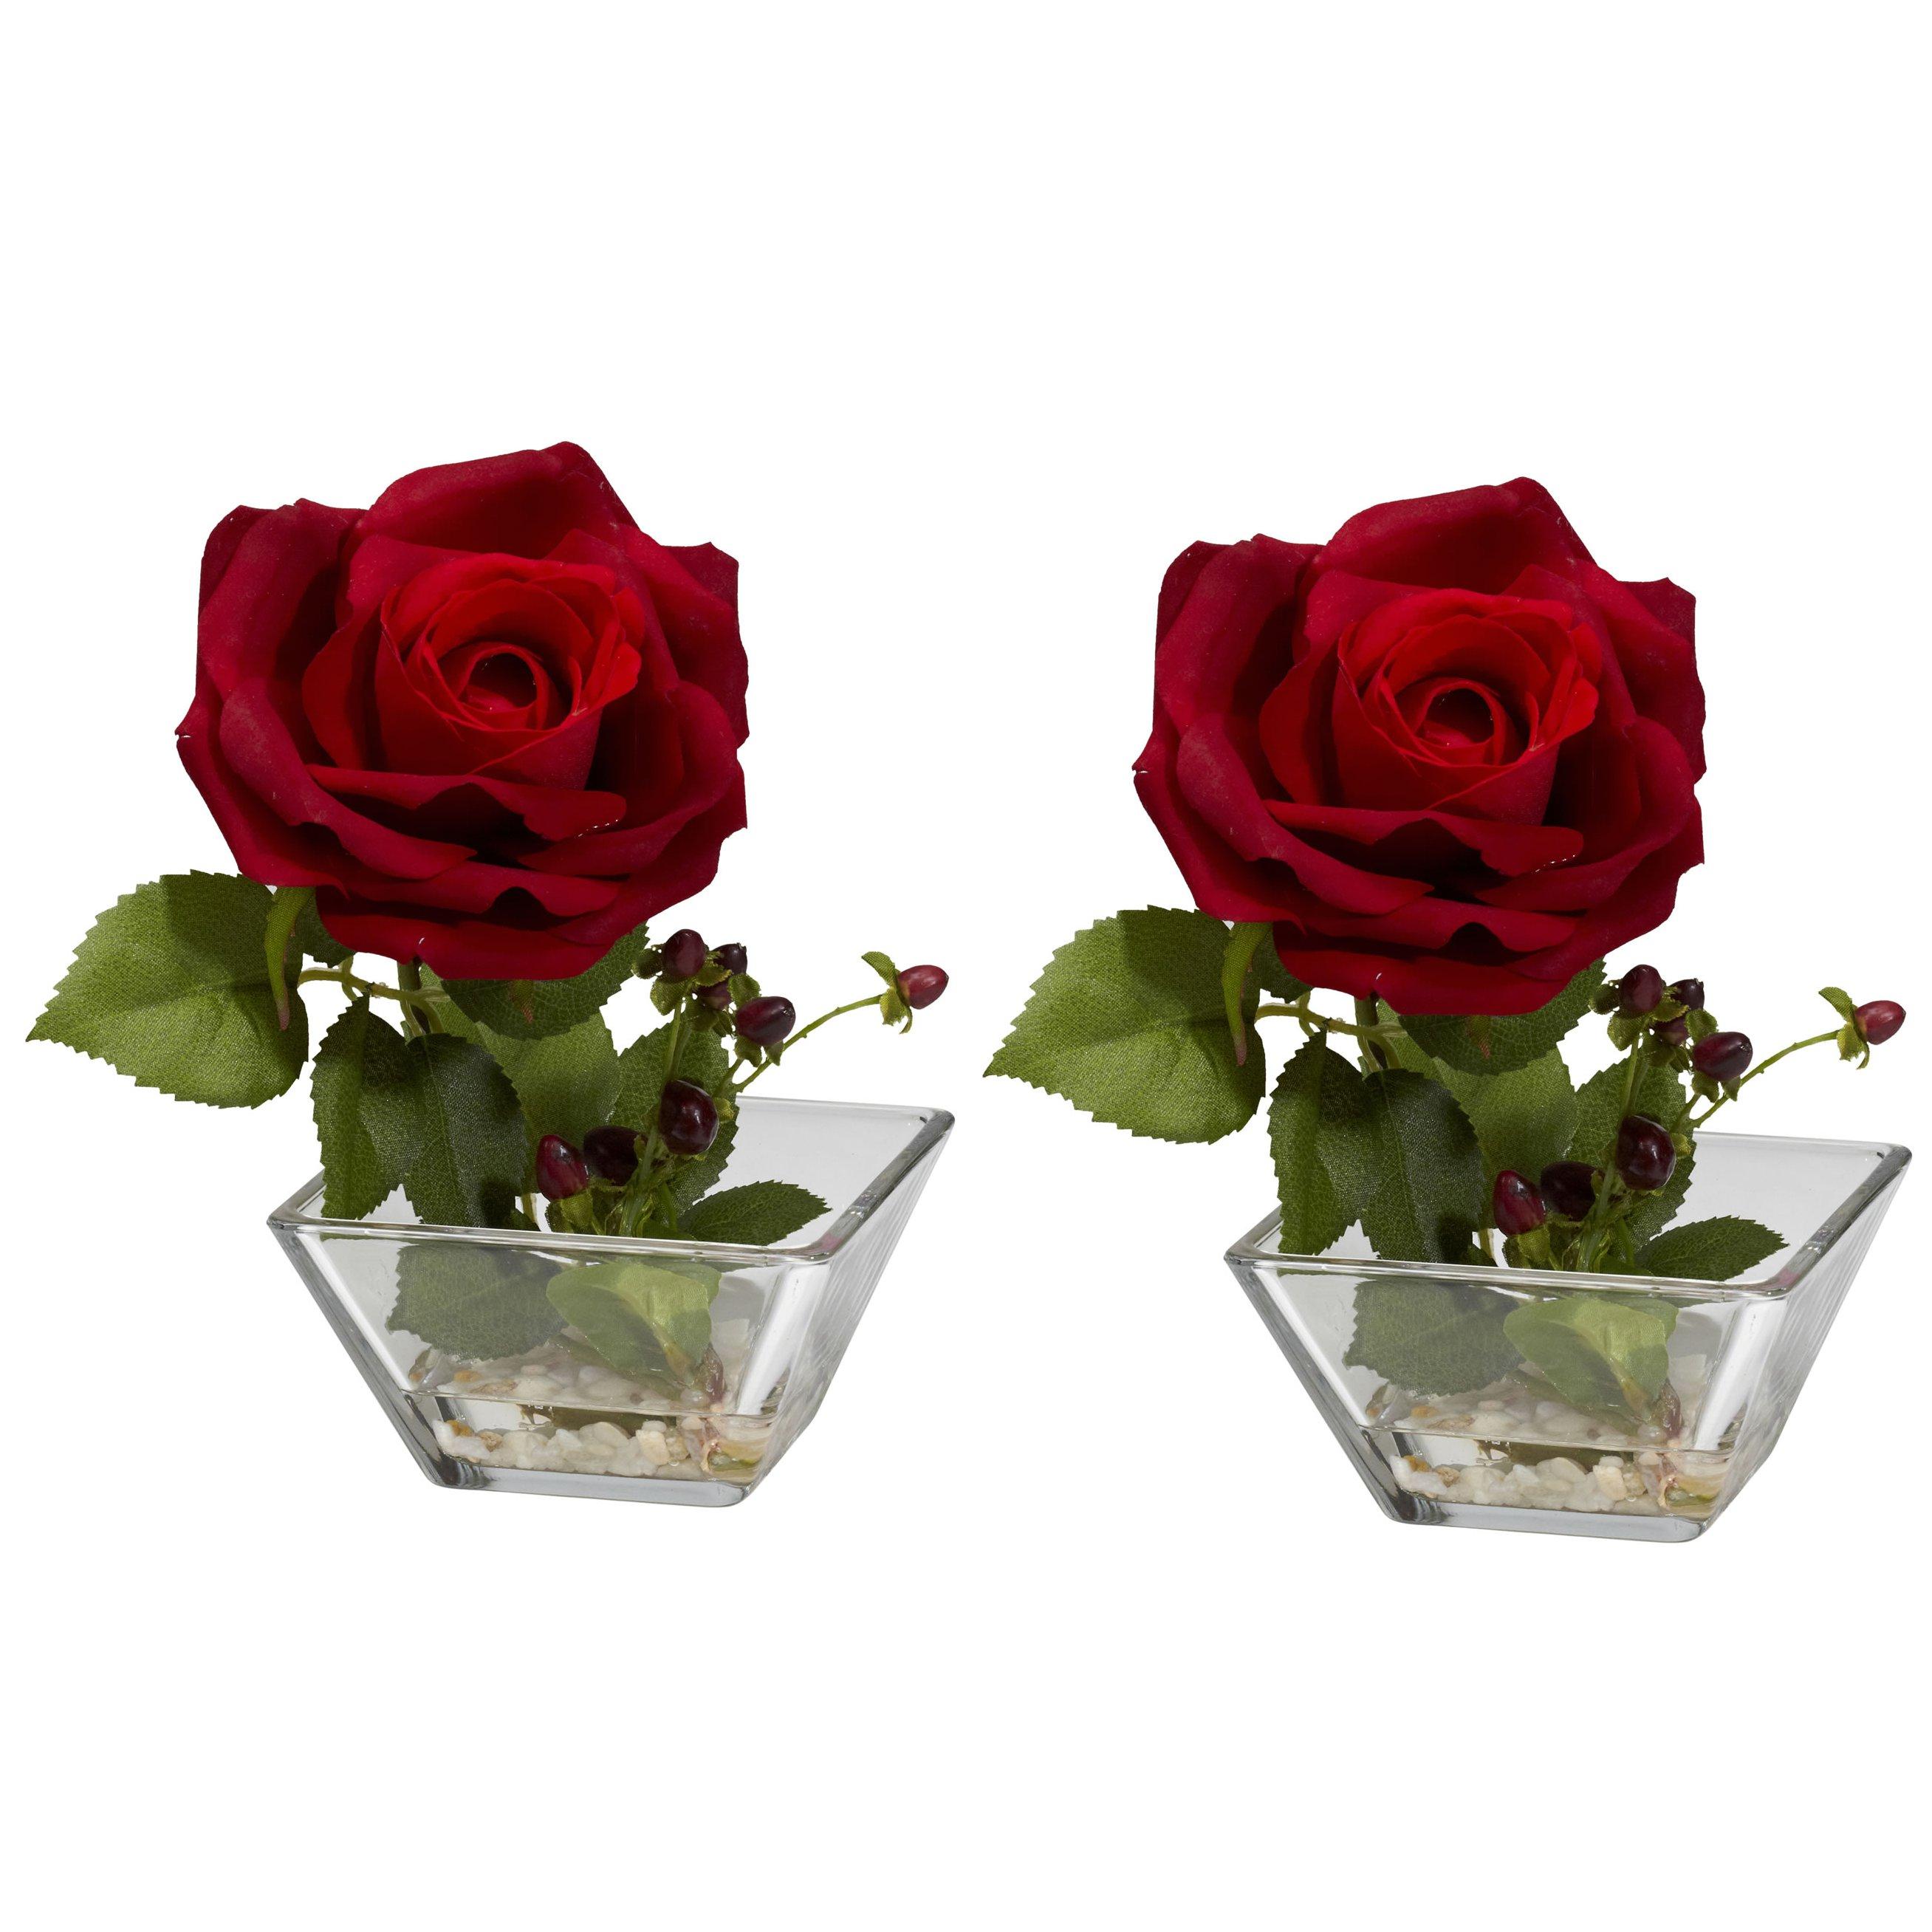 Rose W Square Vase Silk Flower Arrangement Set Of 2 Silk Specialties